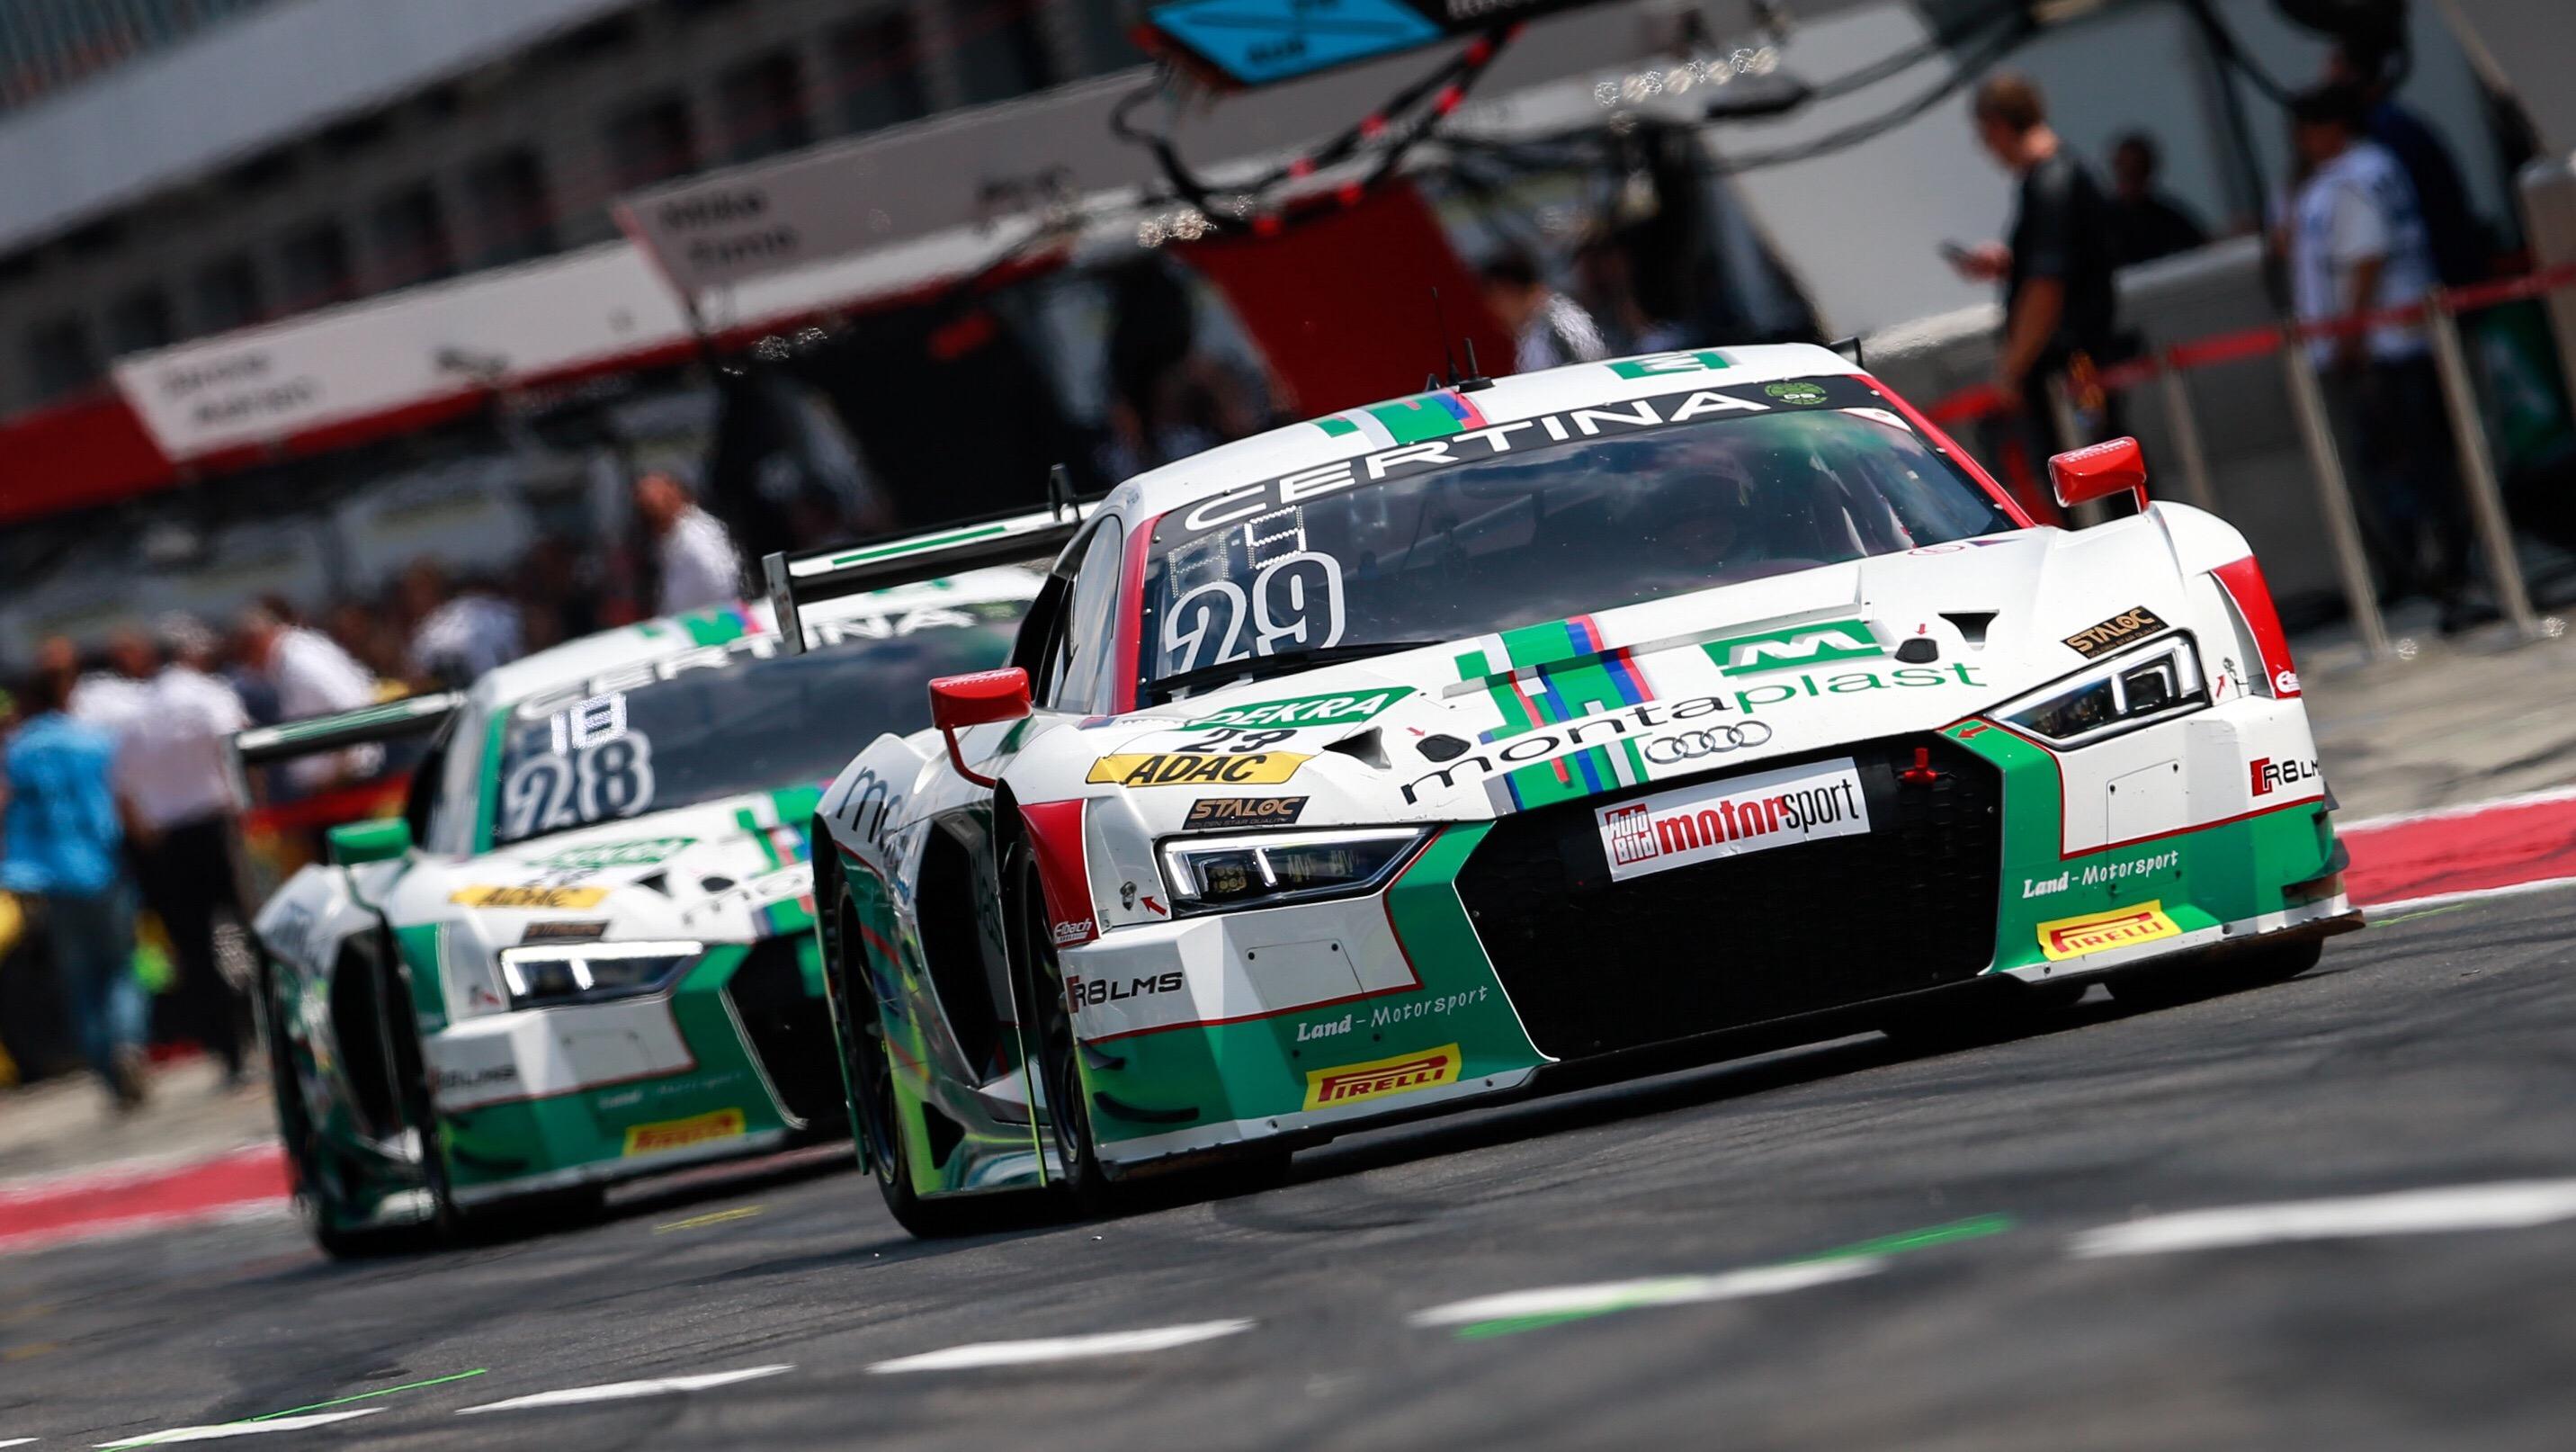 ADAC GT Masters, Lausitzring 2016 GER - Foto: Gruppe C